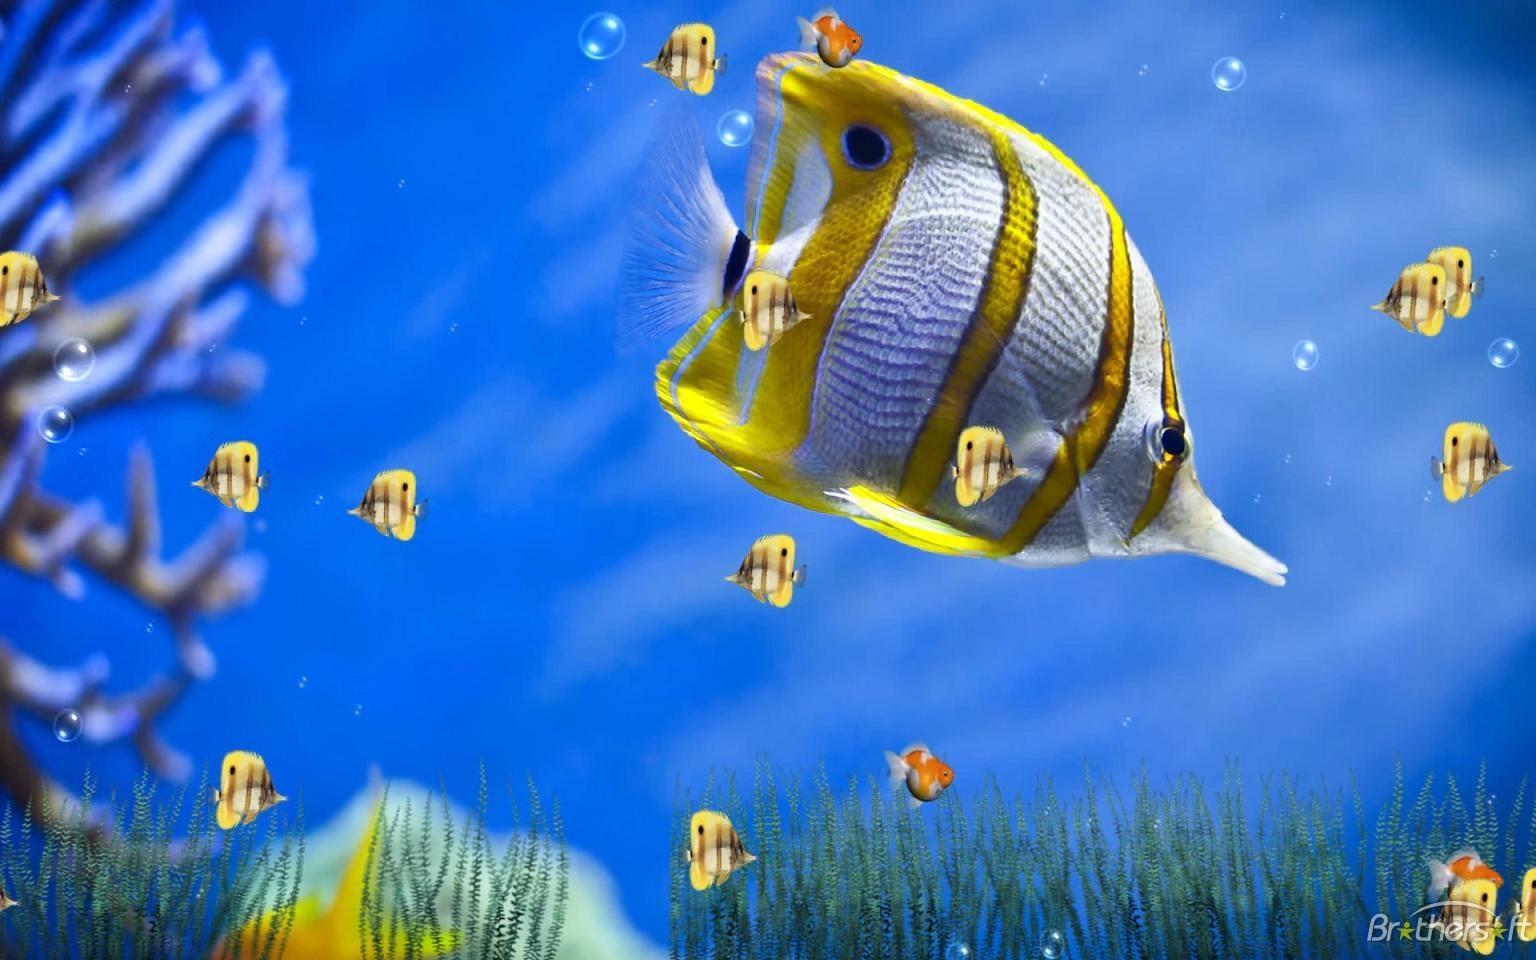 Wallpaper Marine Life Aquarium Animated Wallpaper 10 Download 1536x960